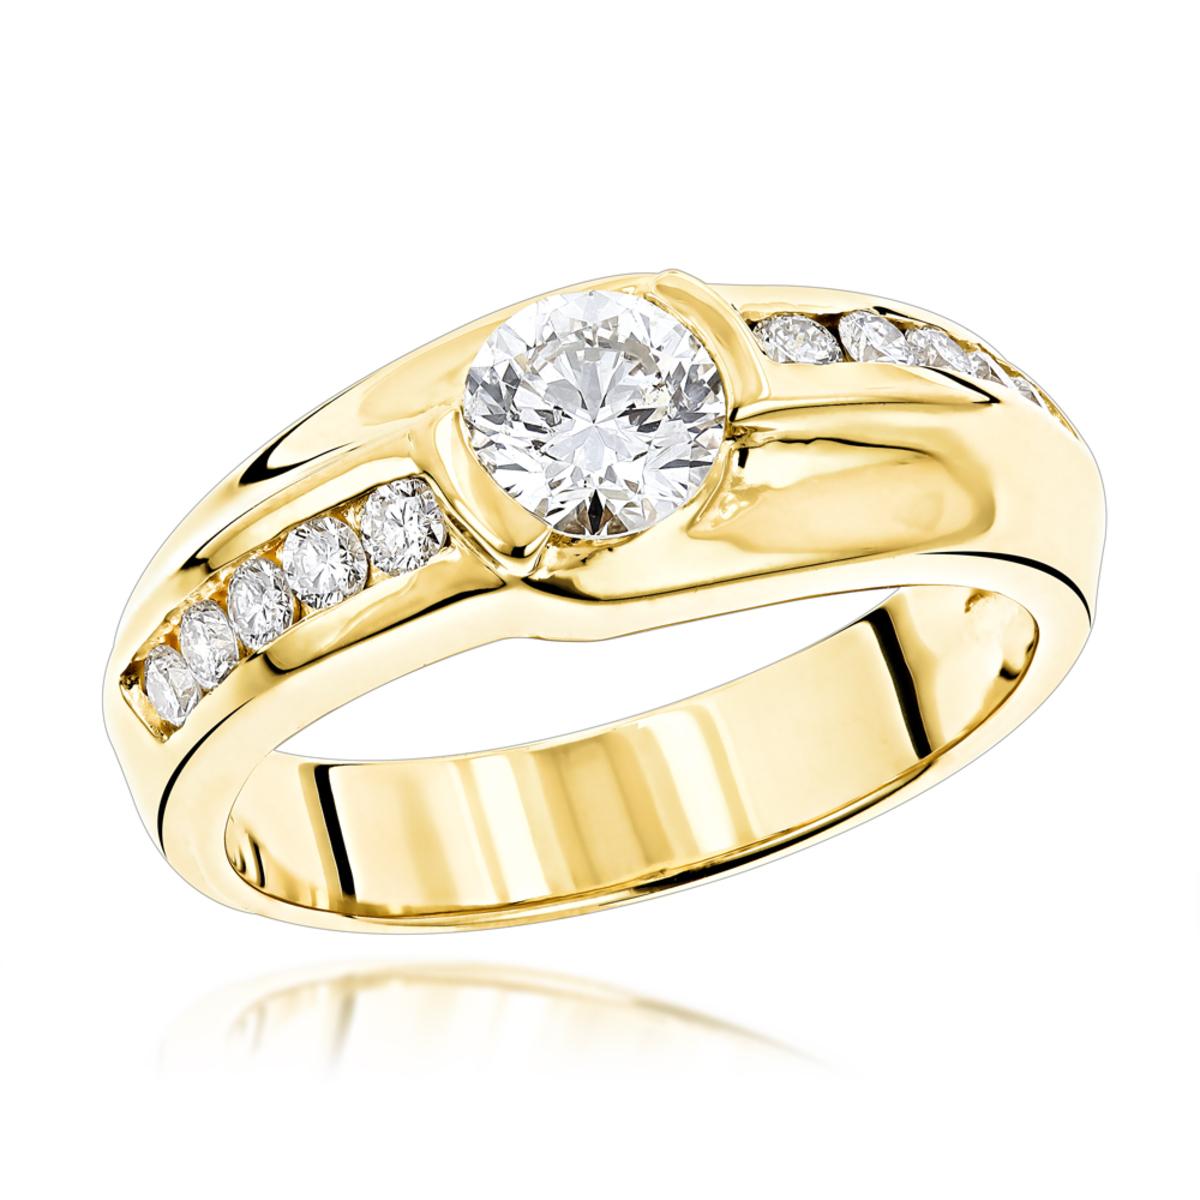 Carat Diamond Ring Price Canada